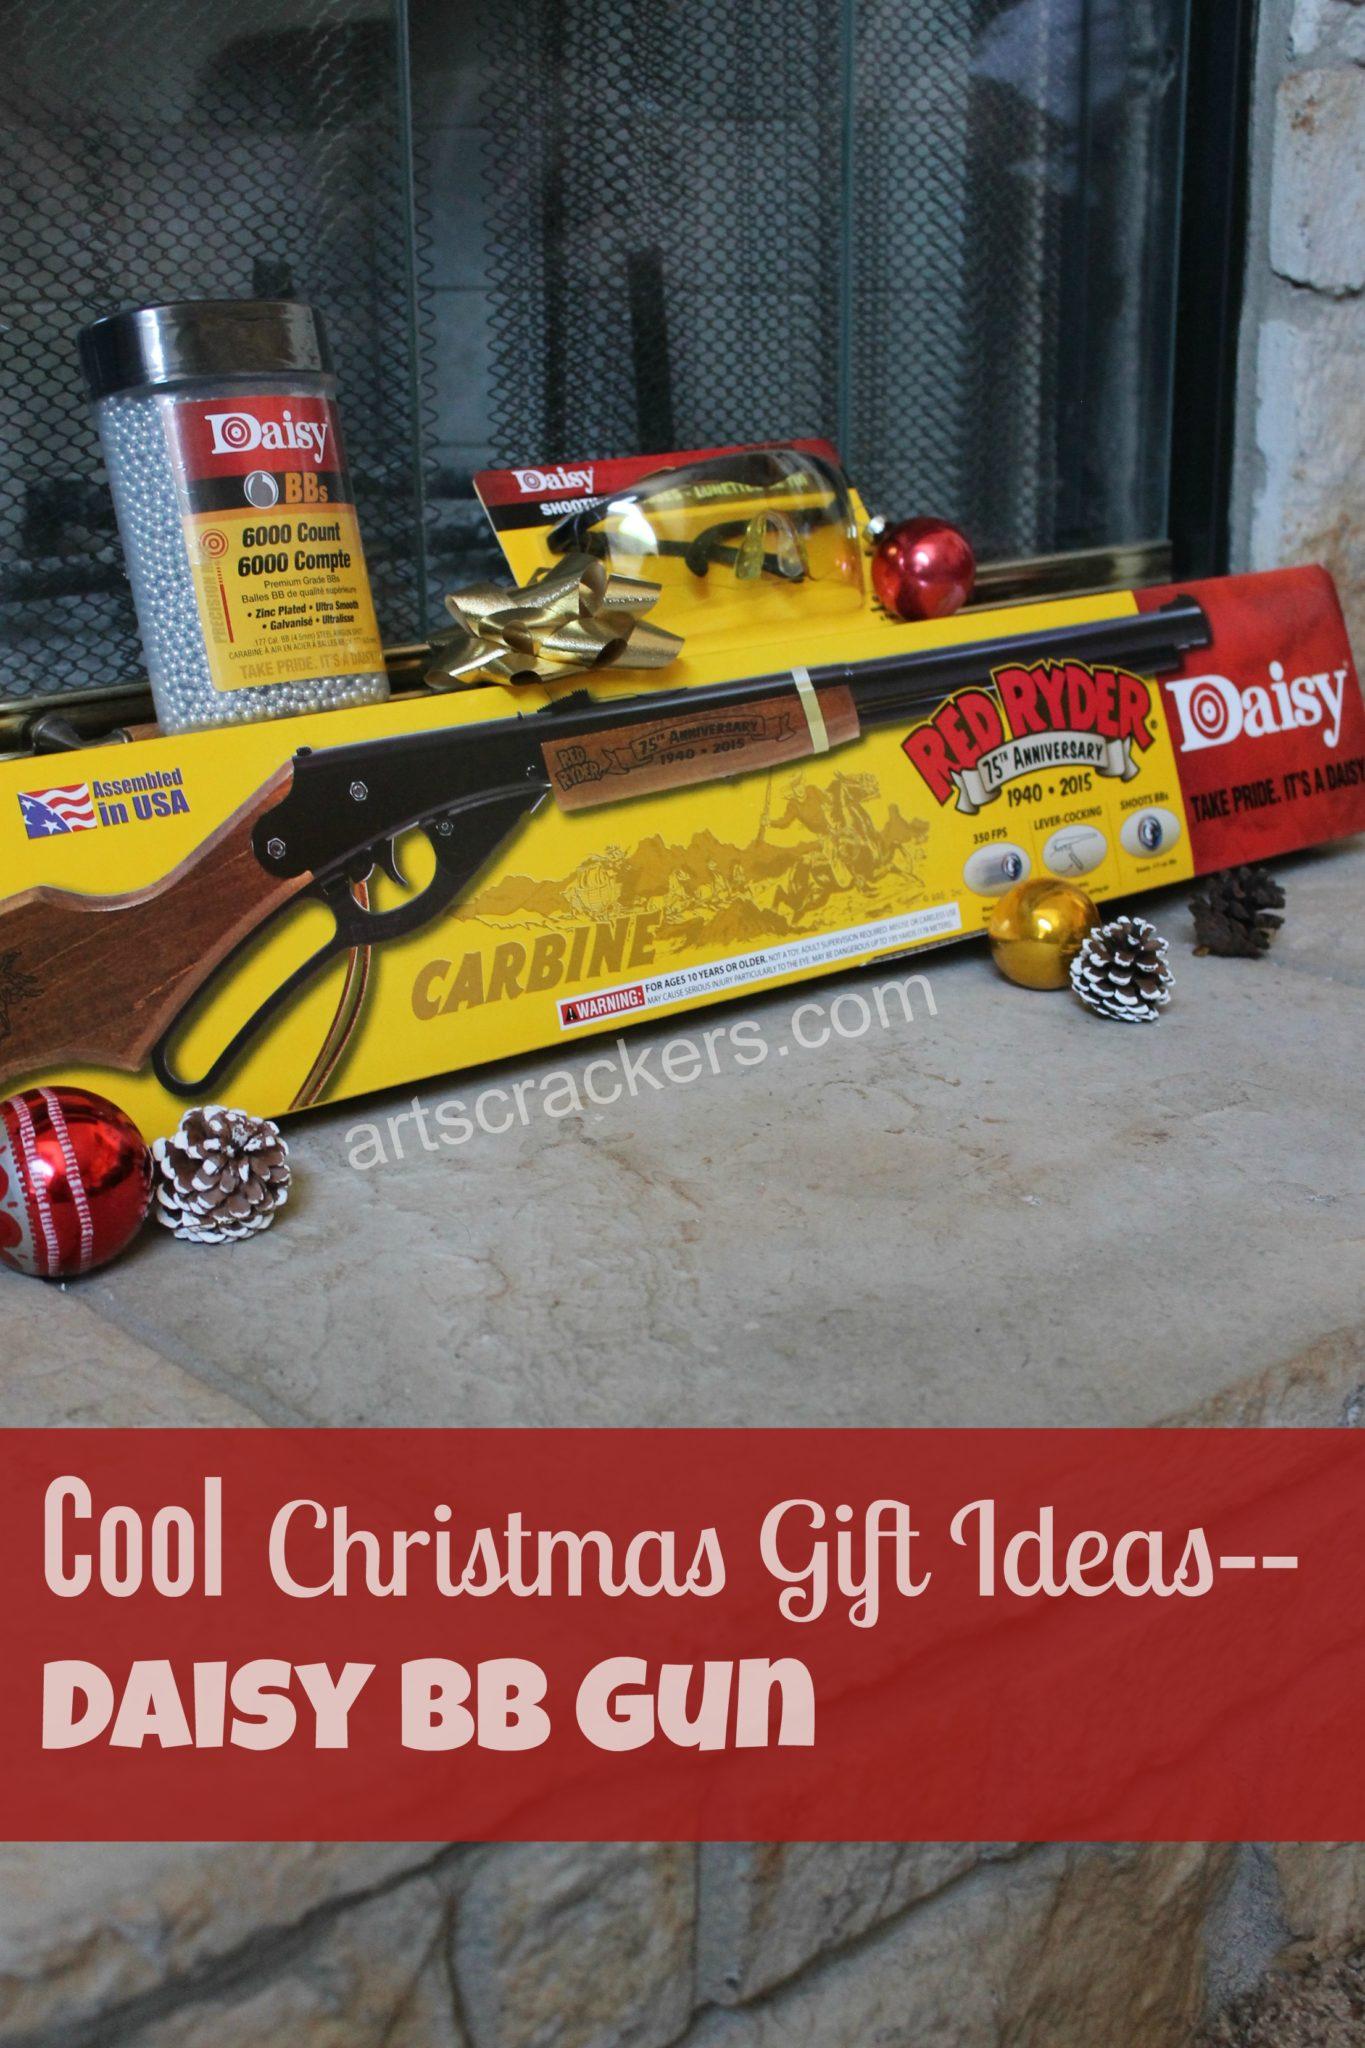 Daisy BB Gun Cool Christmas Gift Idea